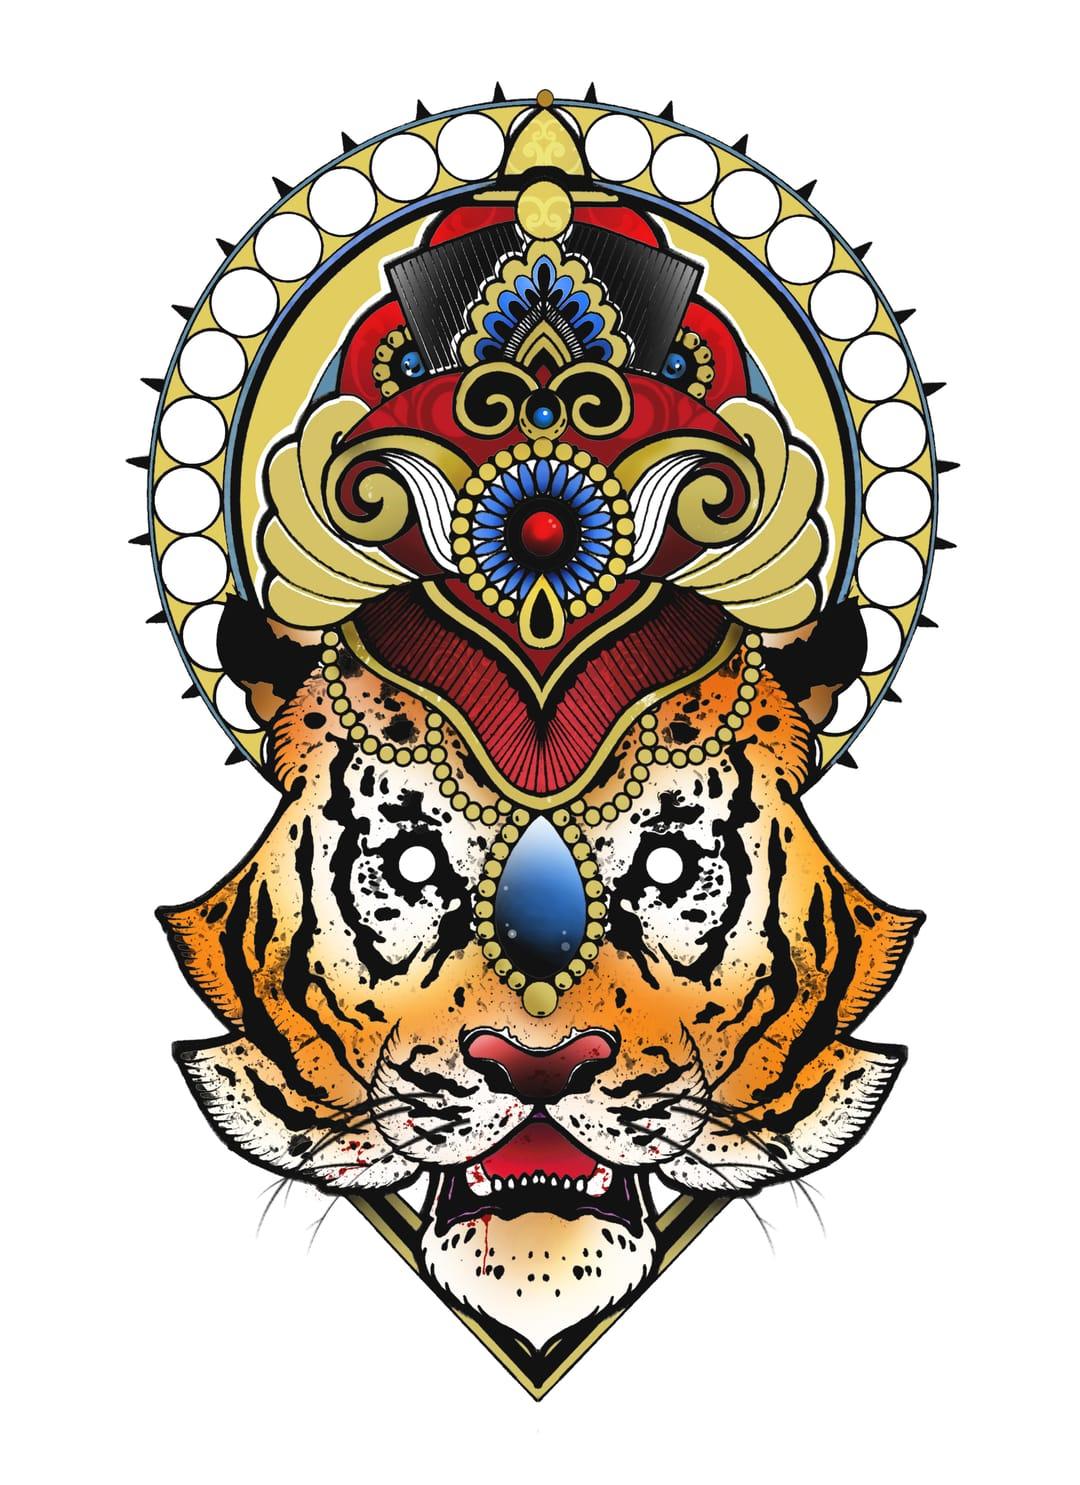 Tiger tattoo design by Shaun Williams.